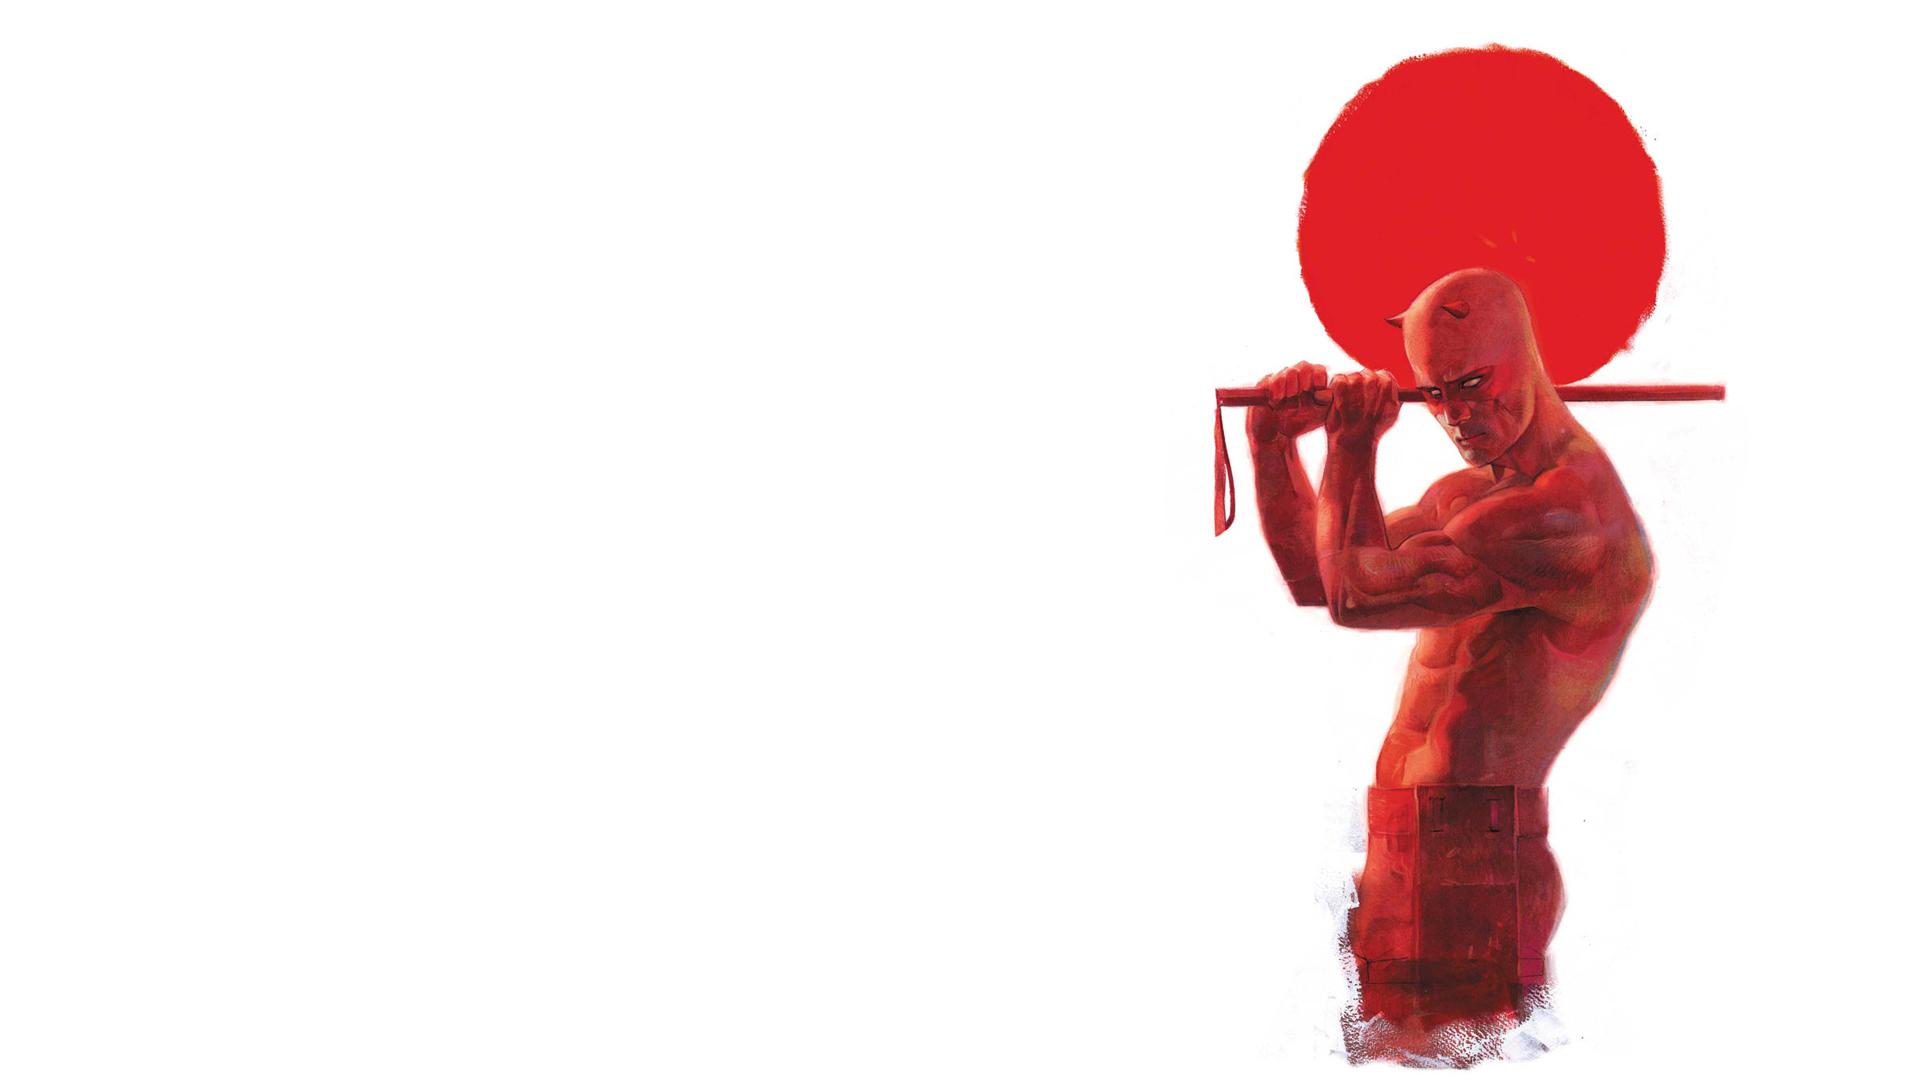 Daredevil Wallpaper HD # | Wide Screen Wallpaper 1080p,2K,4K